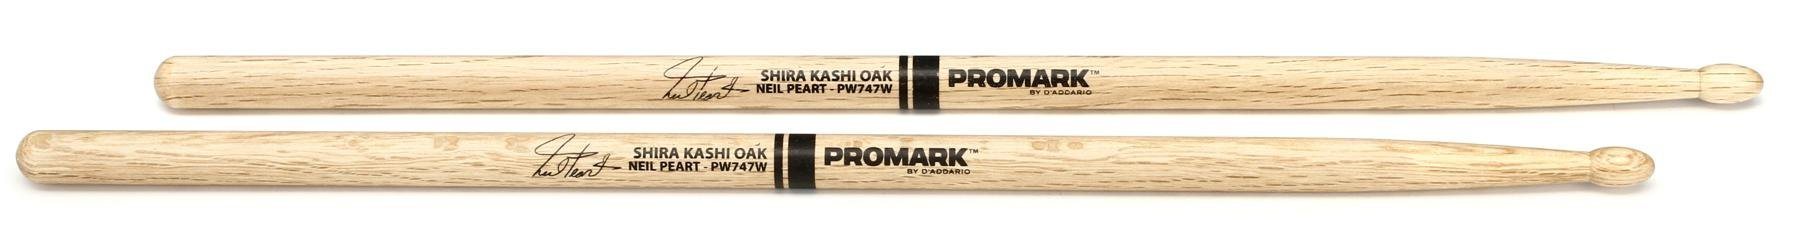 Promark Neil Peart PW747W Shira Kashi Oak